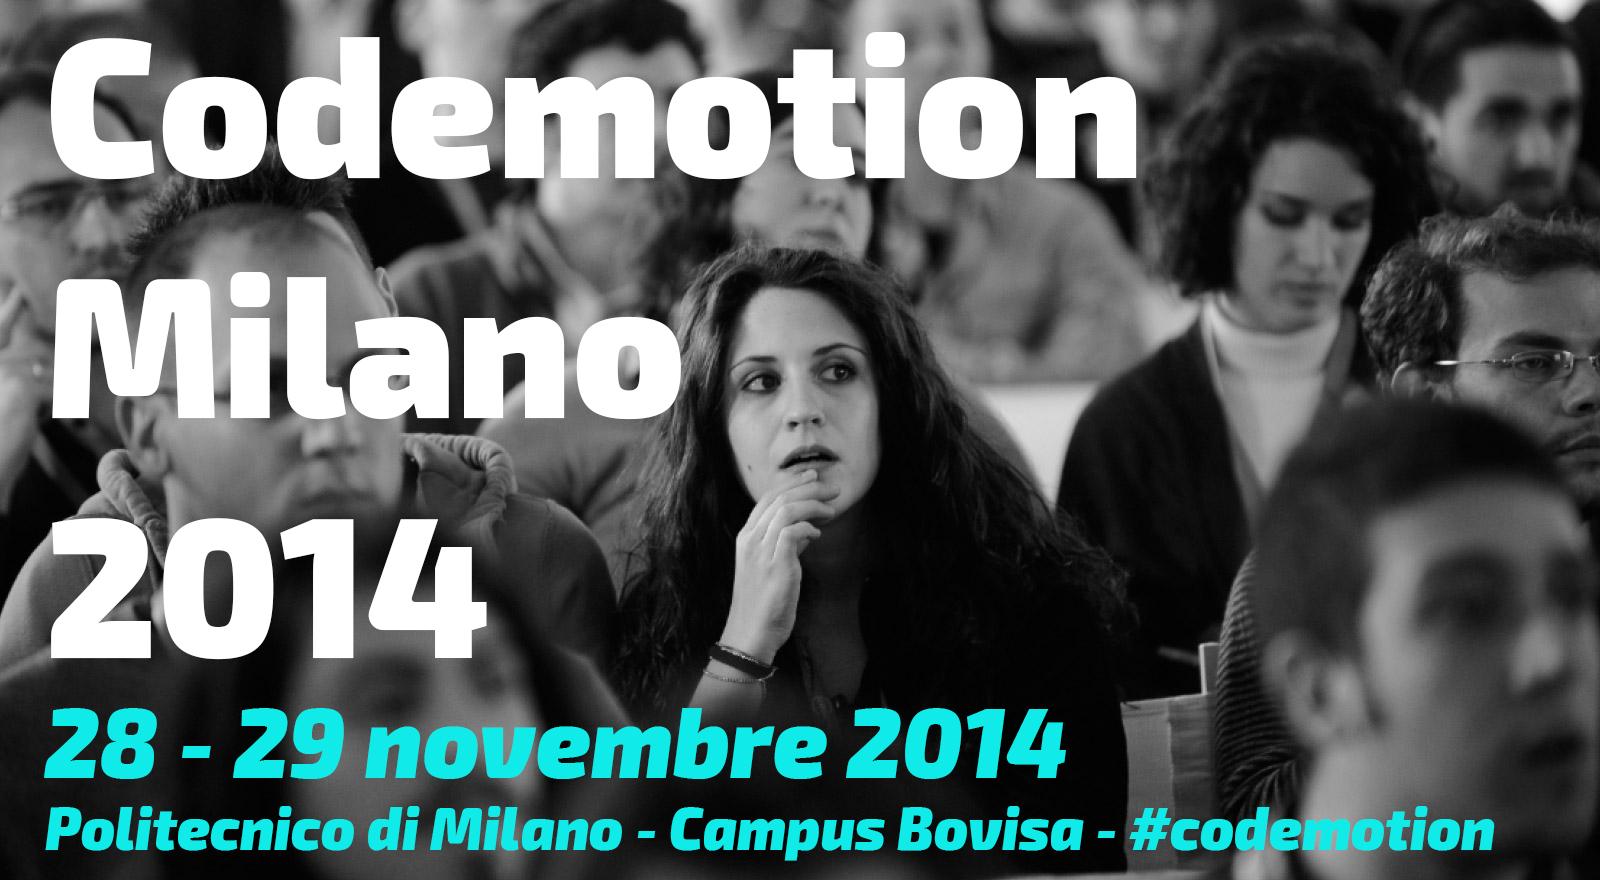 Codemotion Milano 2014